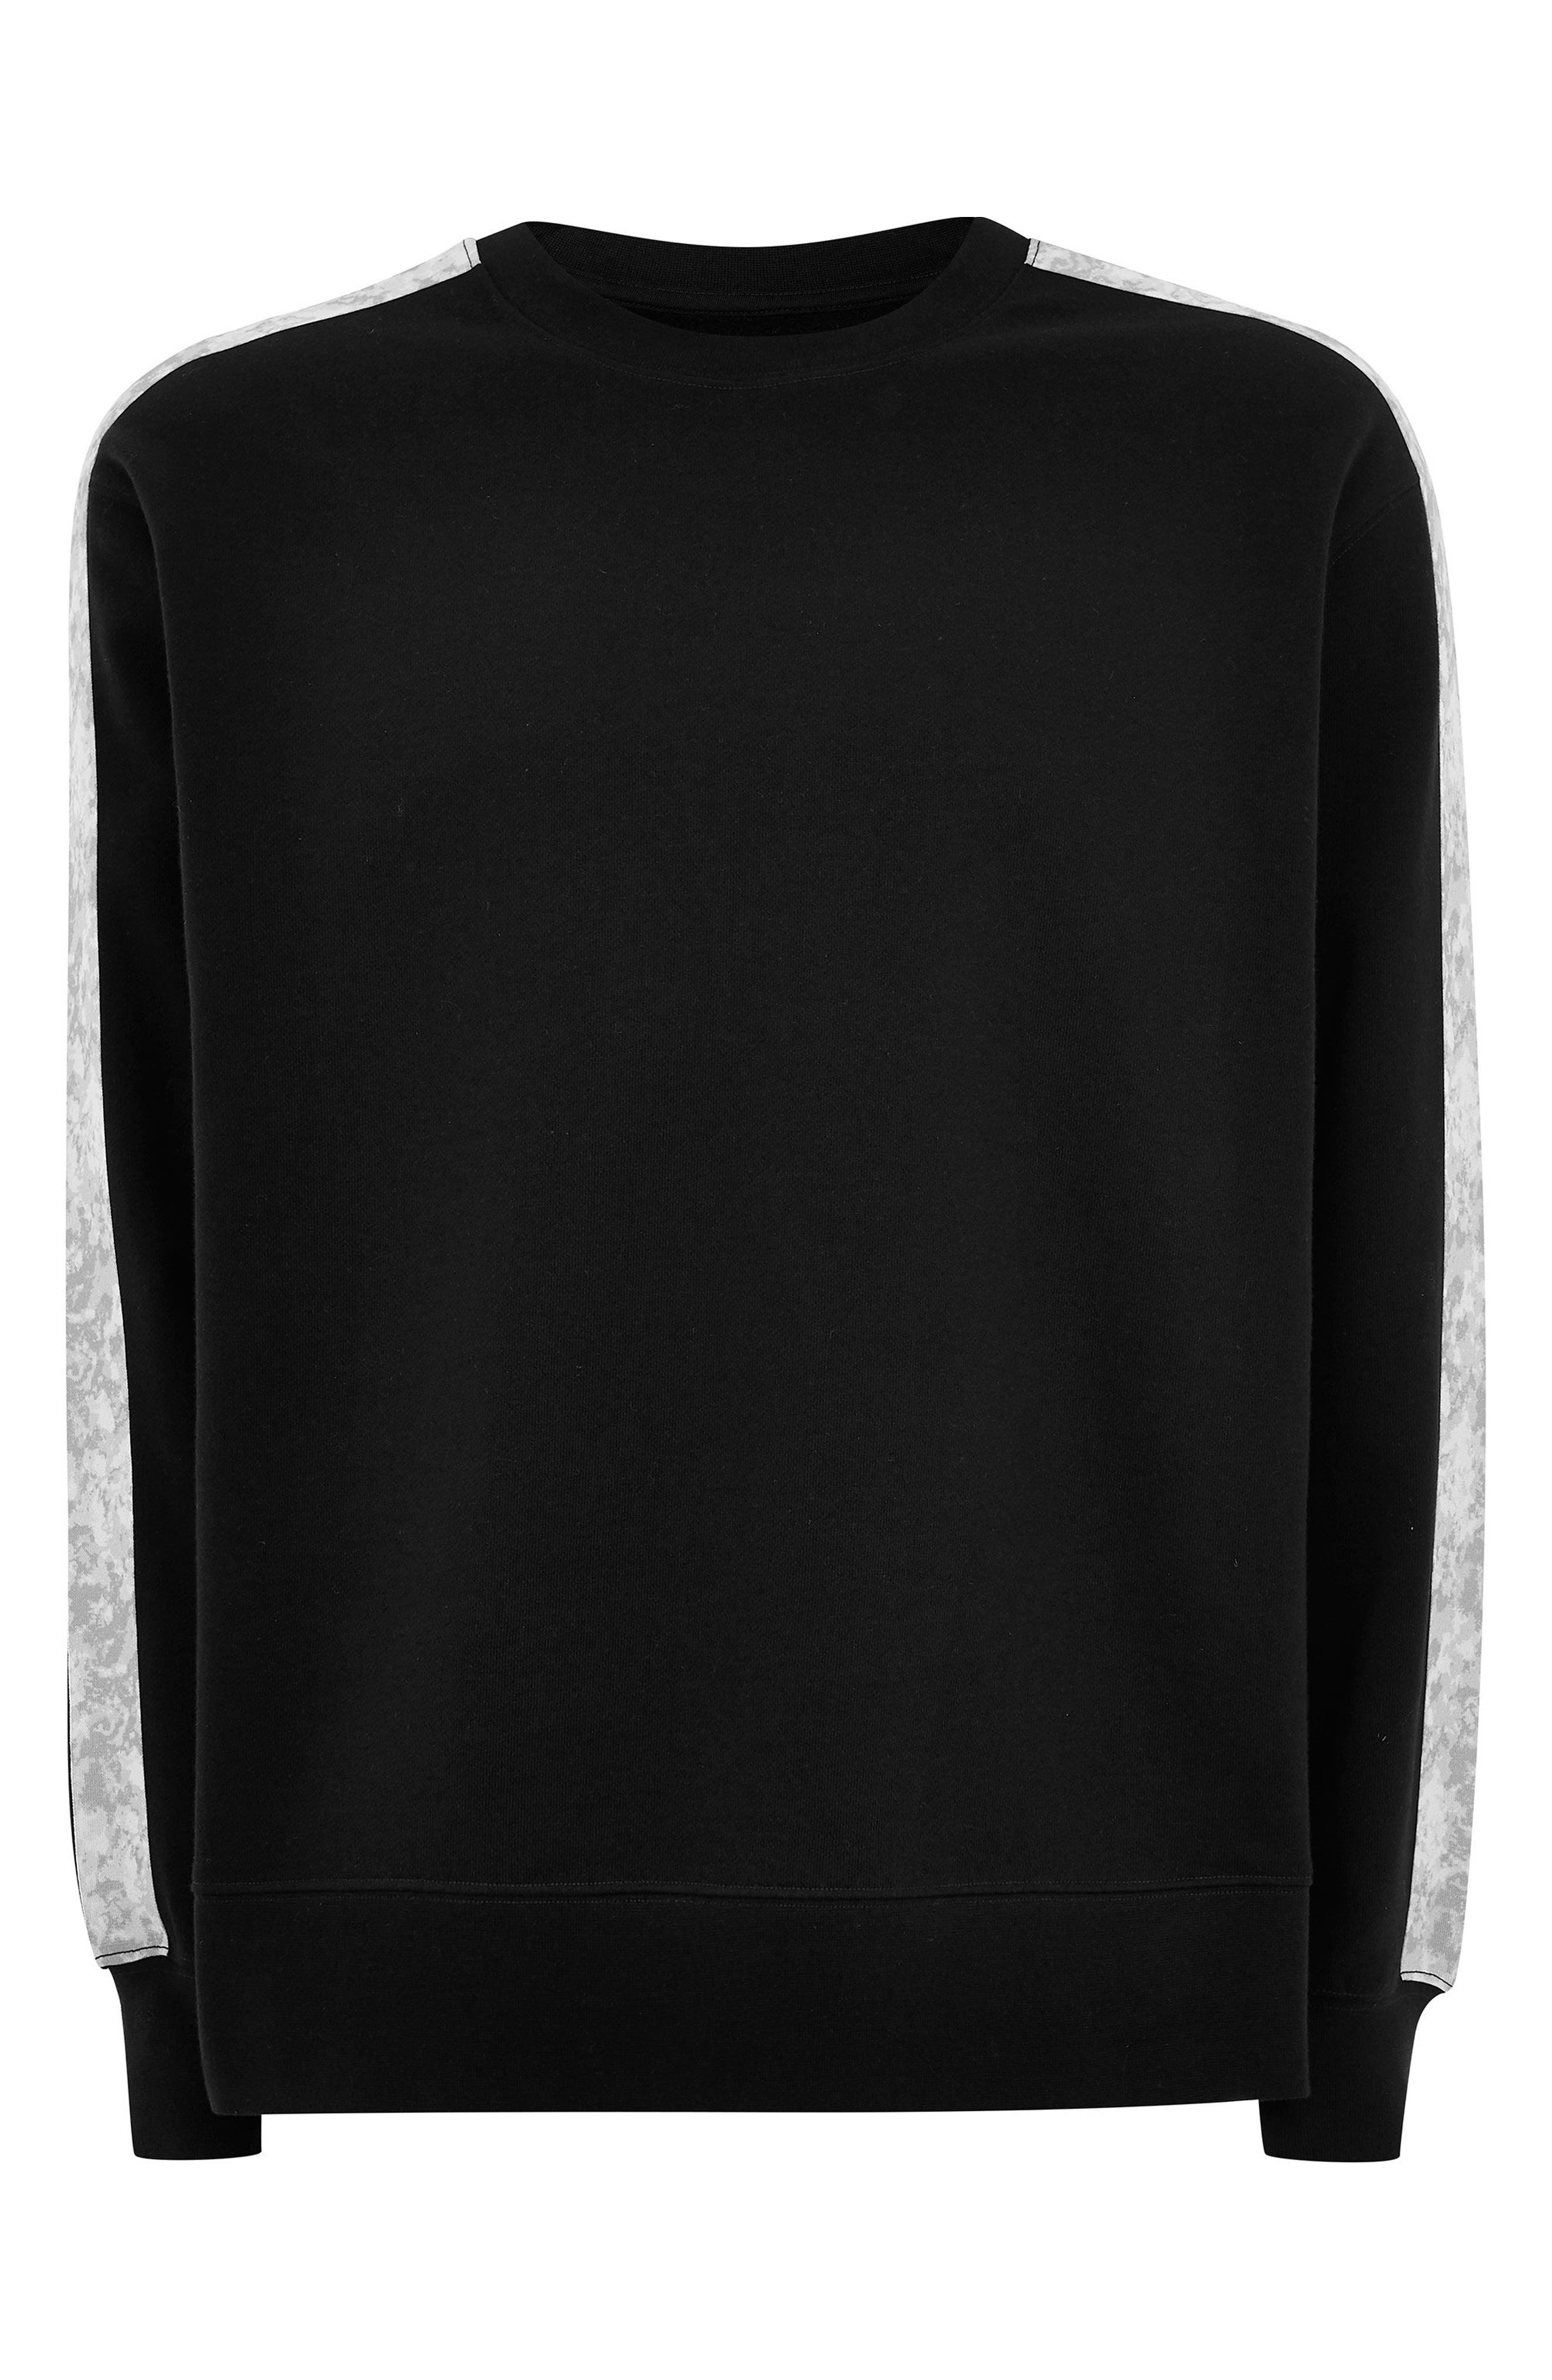 Sublimated Tape Crewneck Sweatshirt,                             Alternate thumbnail 4, color,                             BLACK MULTI